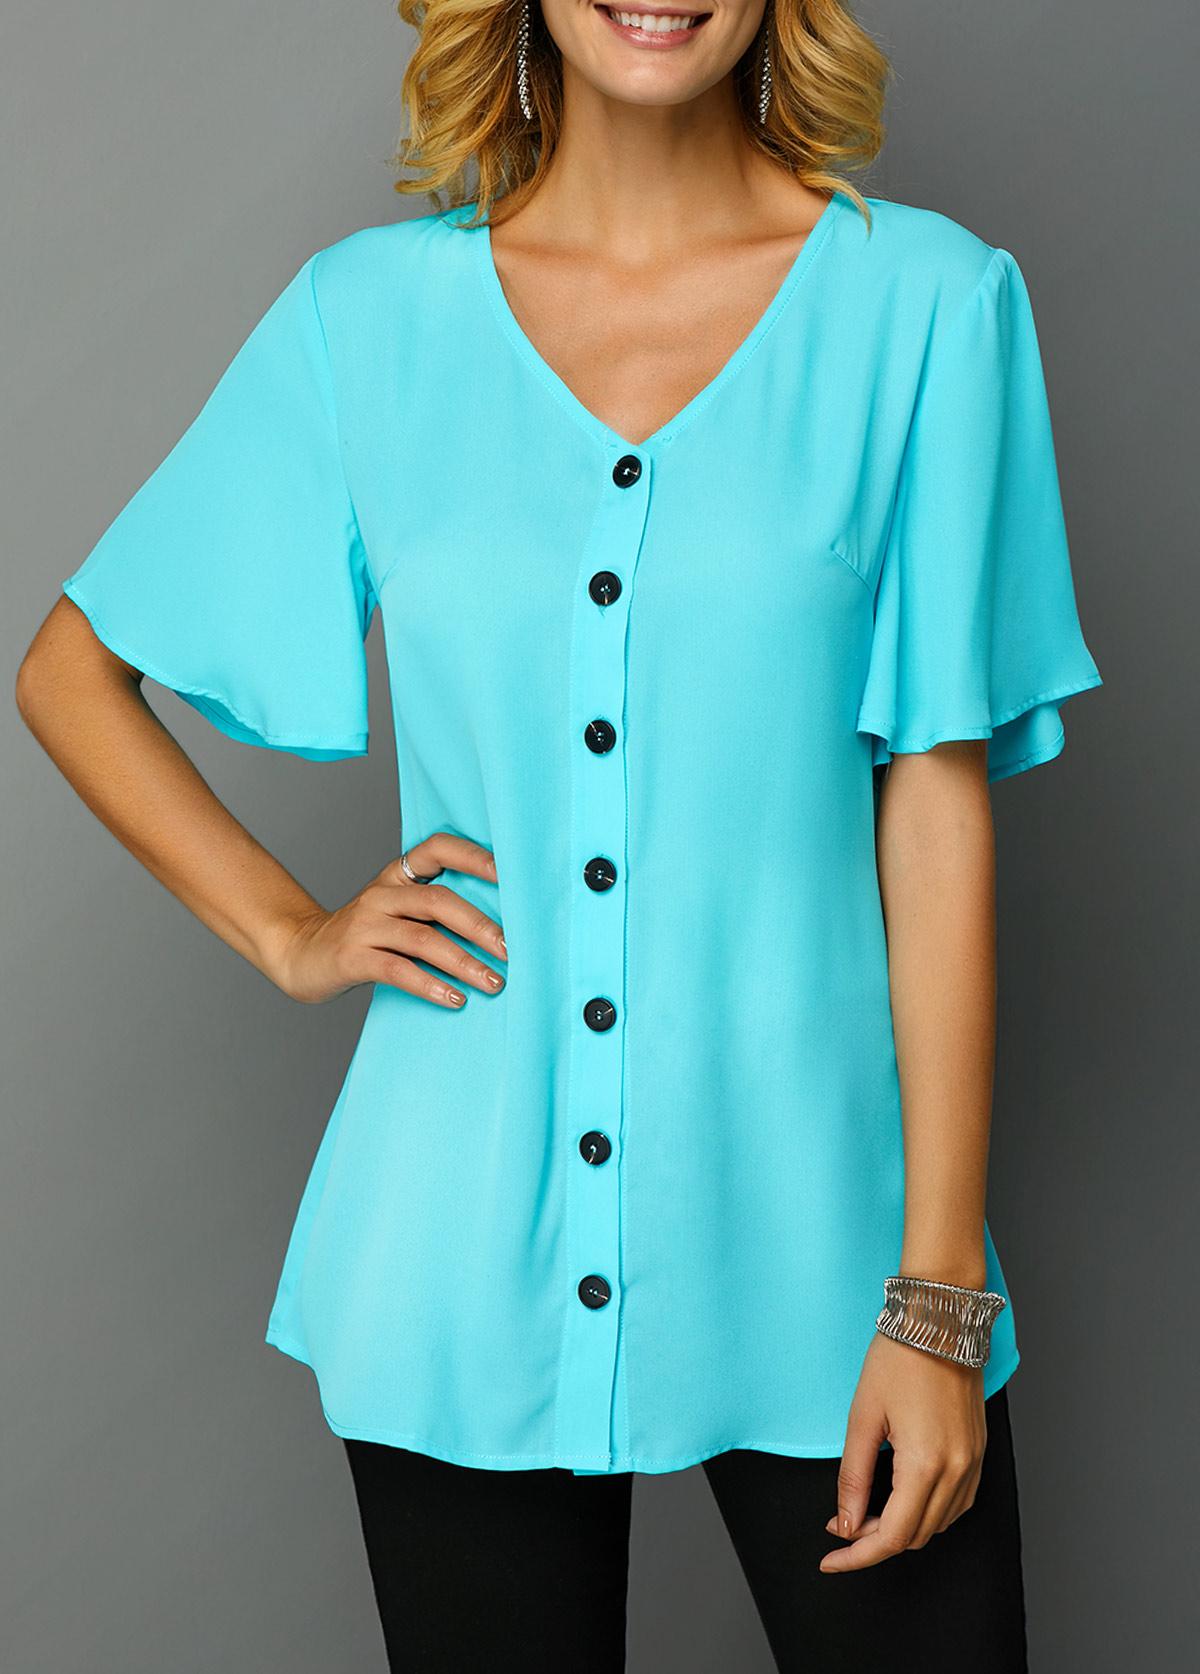 V Neck Short Sleeve Button Up T Shirt